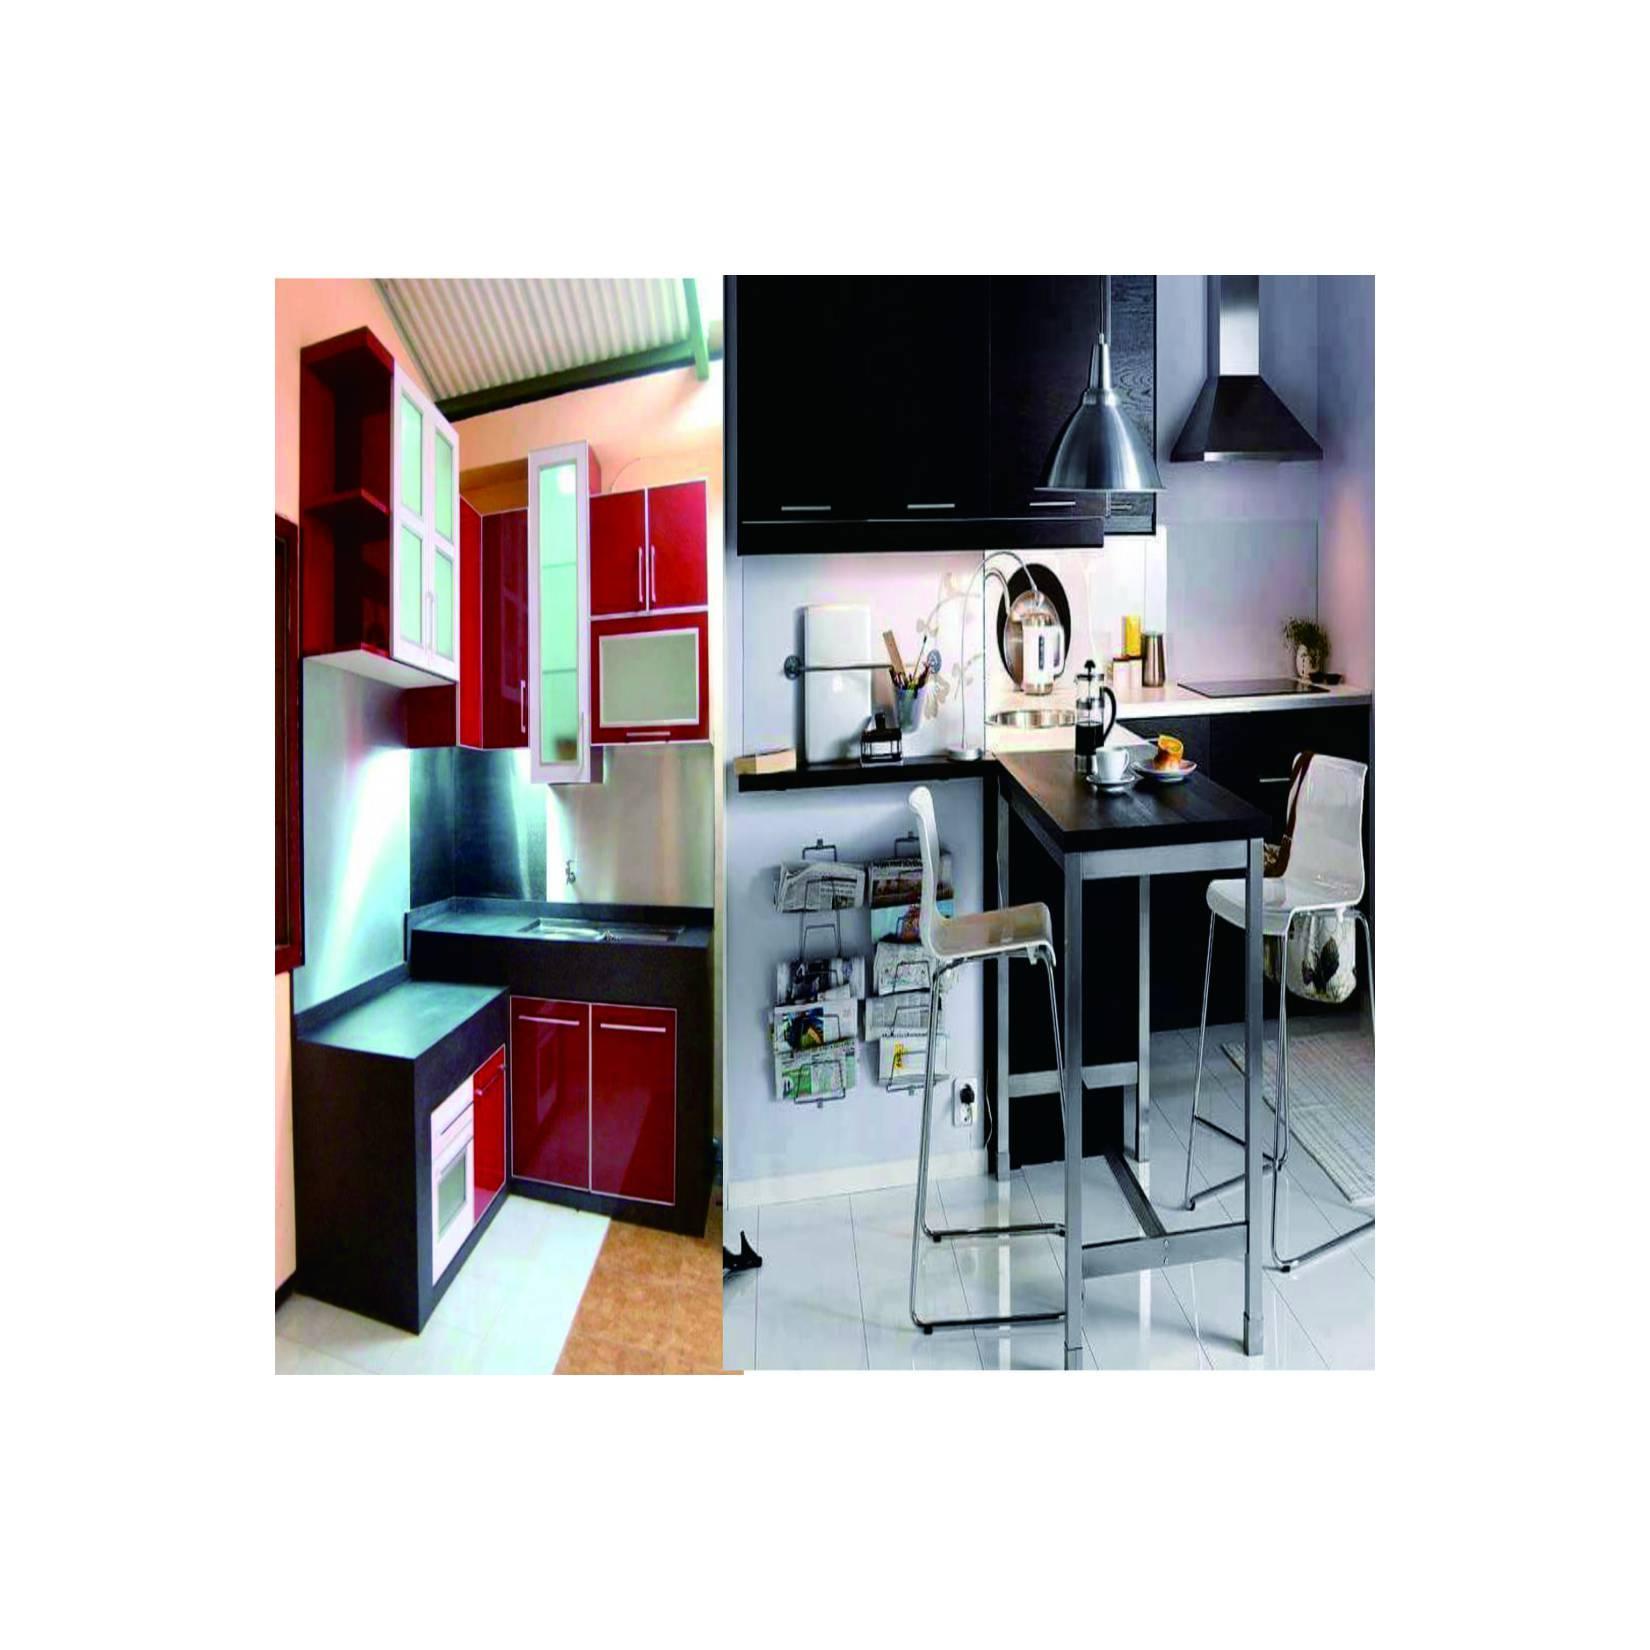 Kitchen set rak lemari dapur Minimalis,Mewah dengan TOP GRANIT.